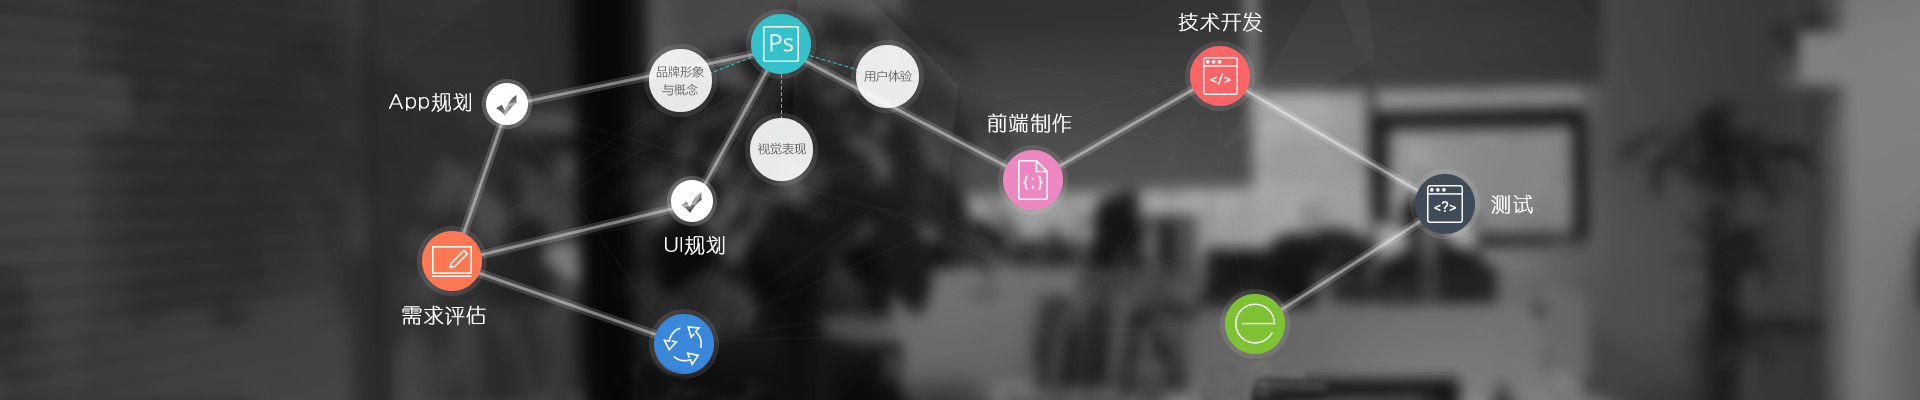 ap开发流程图,手机app开发流程,移动app开发流程,企业app开发流程